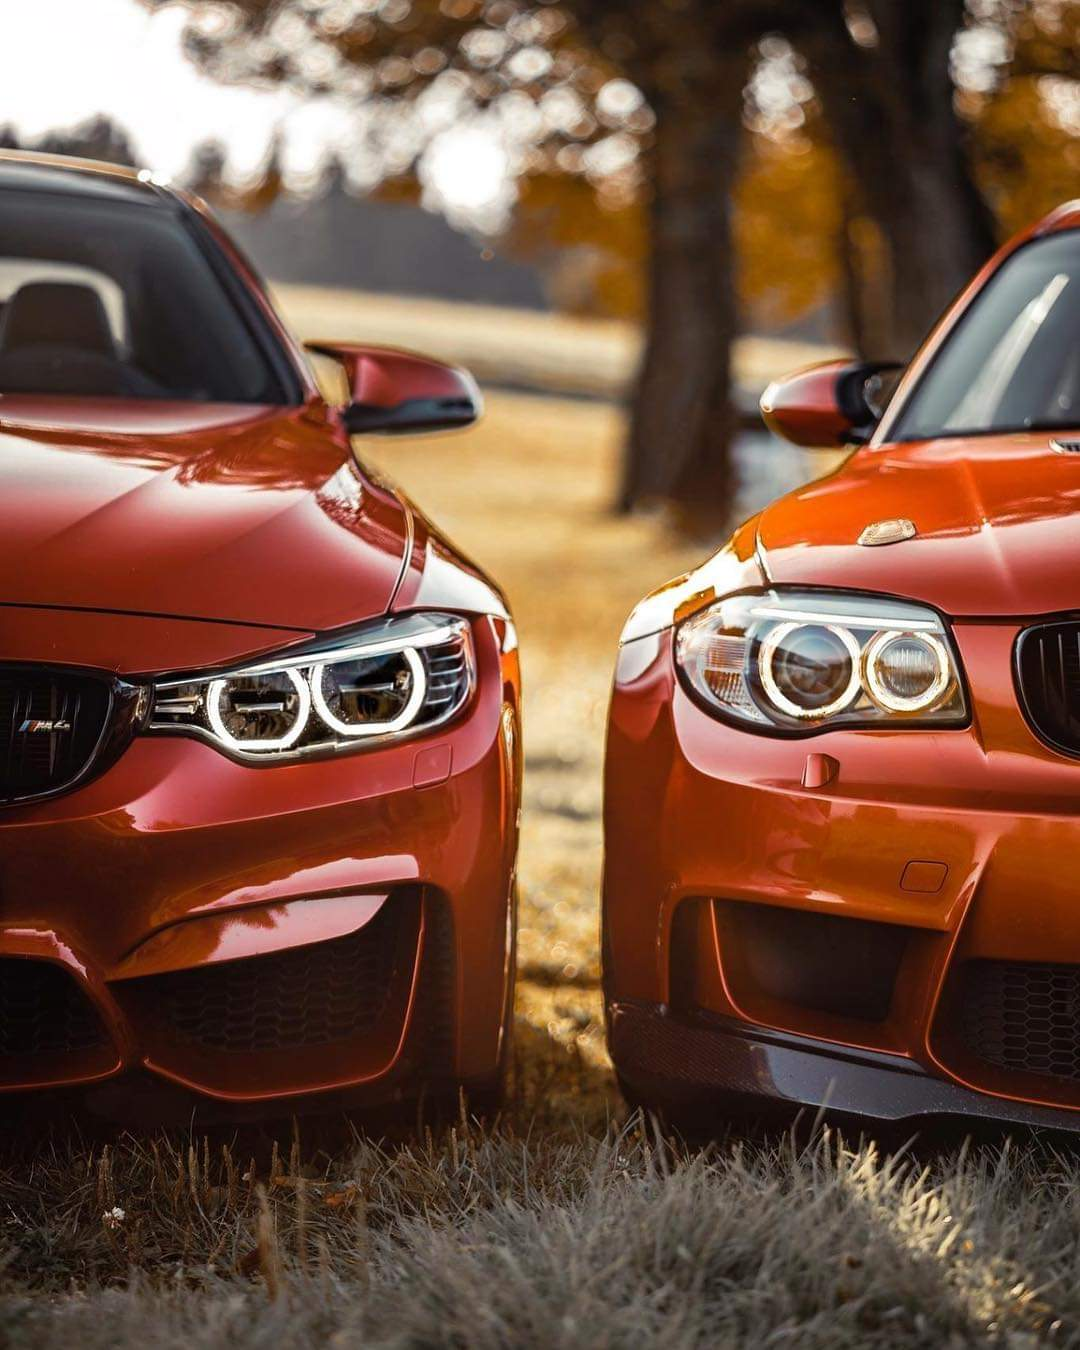 BMW Série 3 VII [Berline G20, Touring G21, M3 G80] [2018